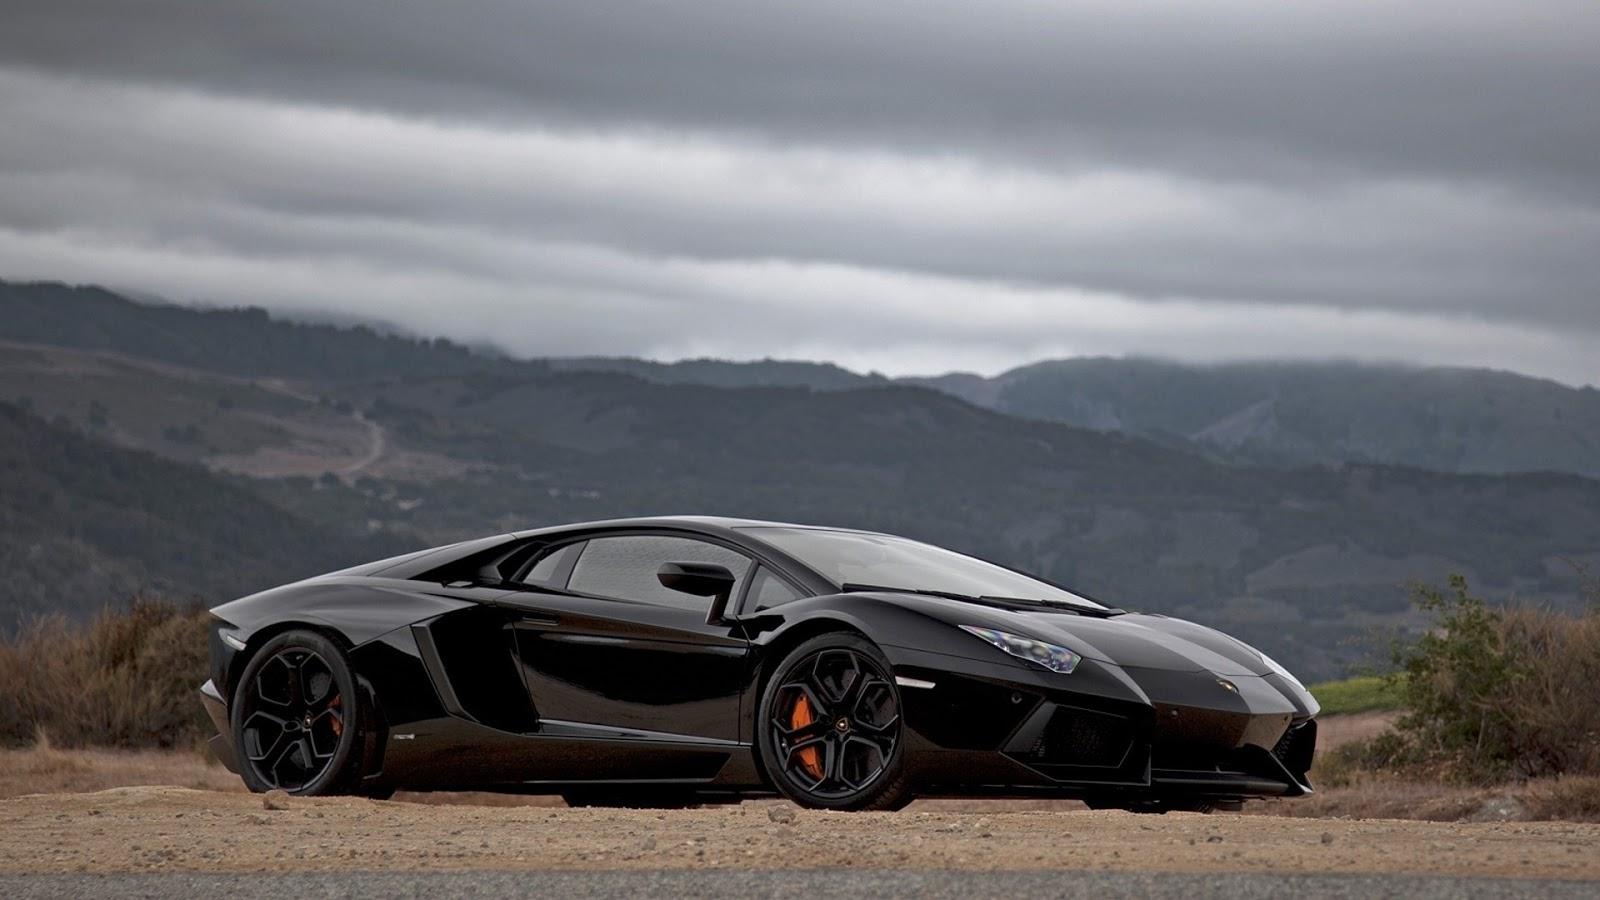 Black Lamborghini Aventador Wallpaper on Mountain